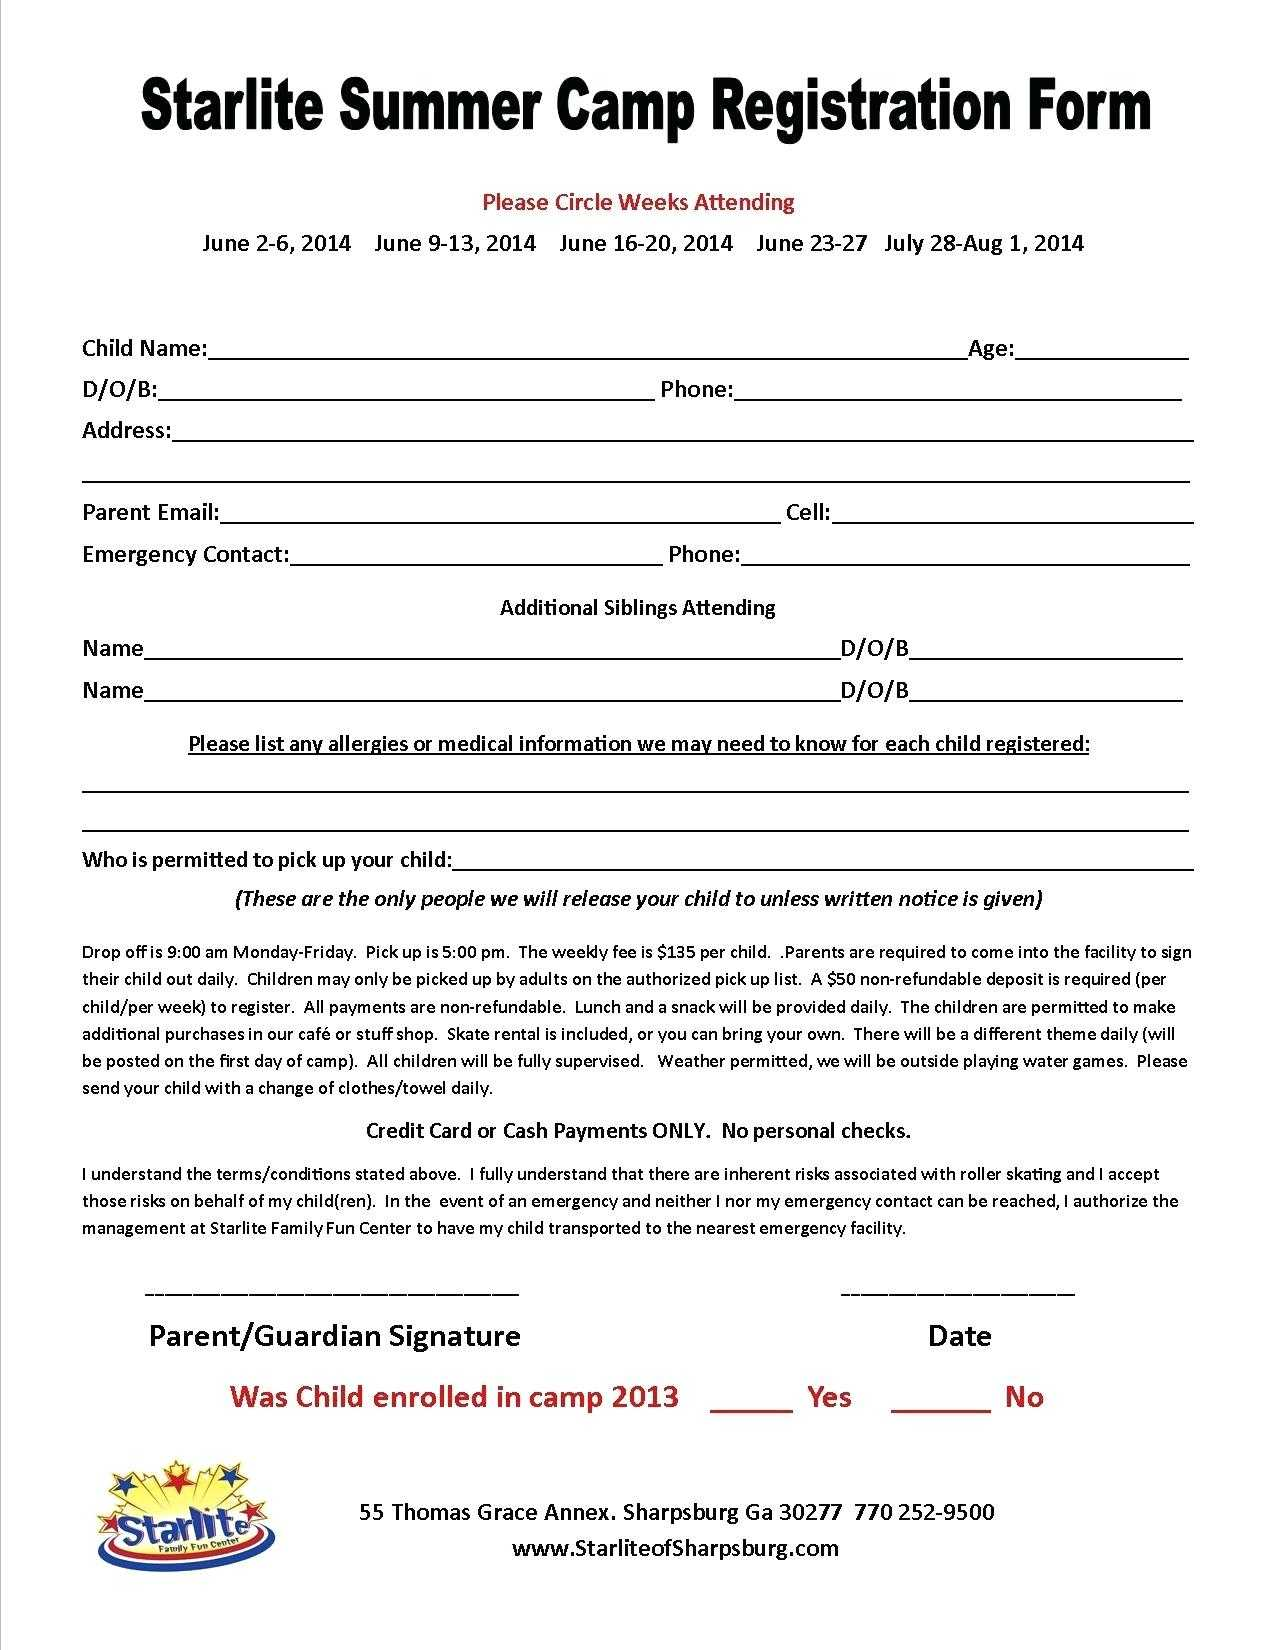 014 Free Printable Camp Registration Form Templates Hotel With Regard To Camp Registration Form Template Word